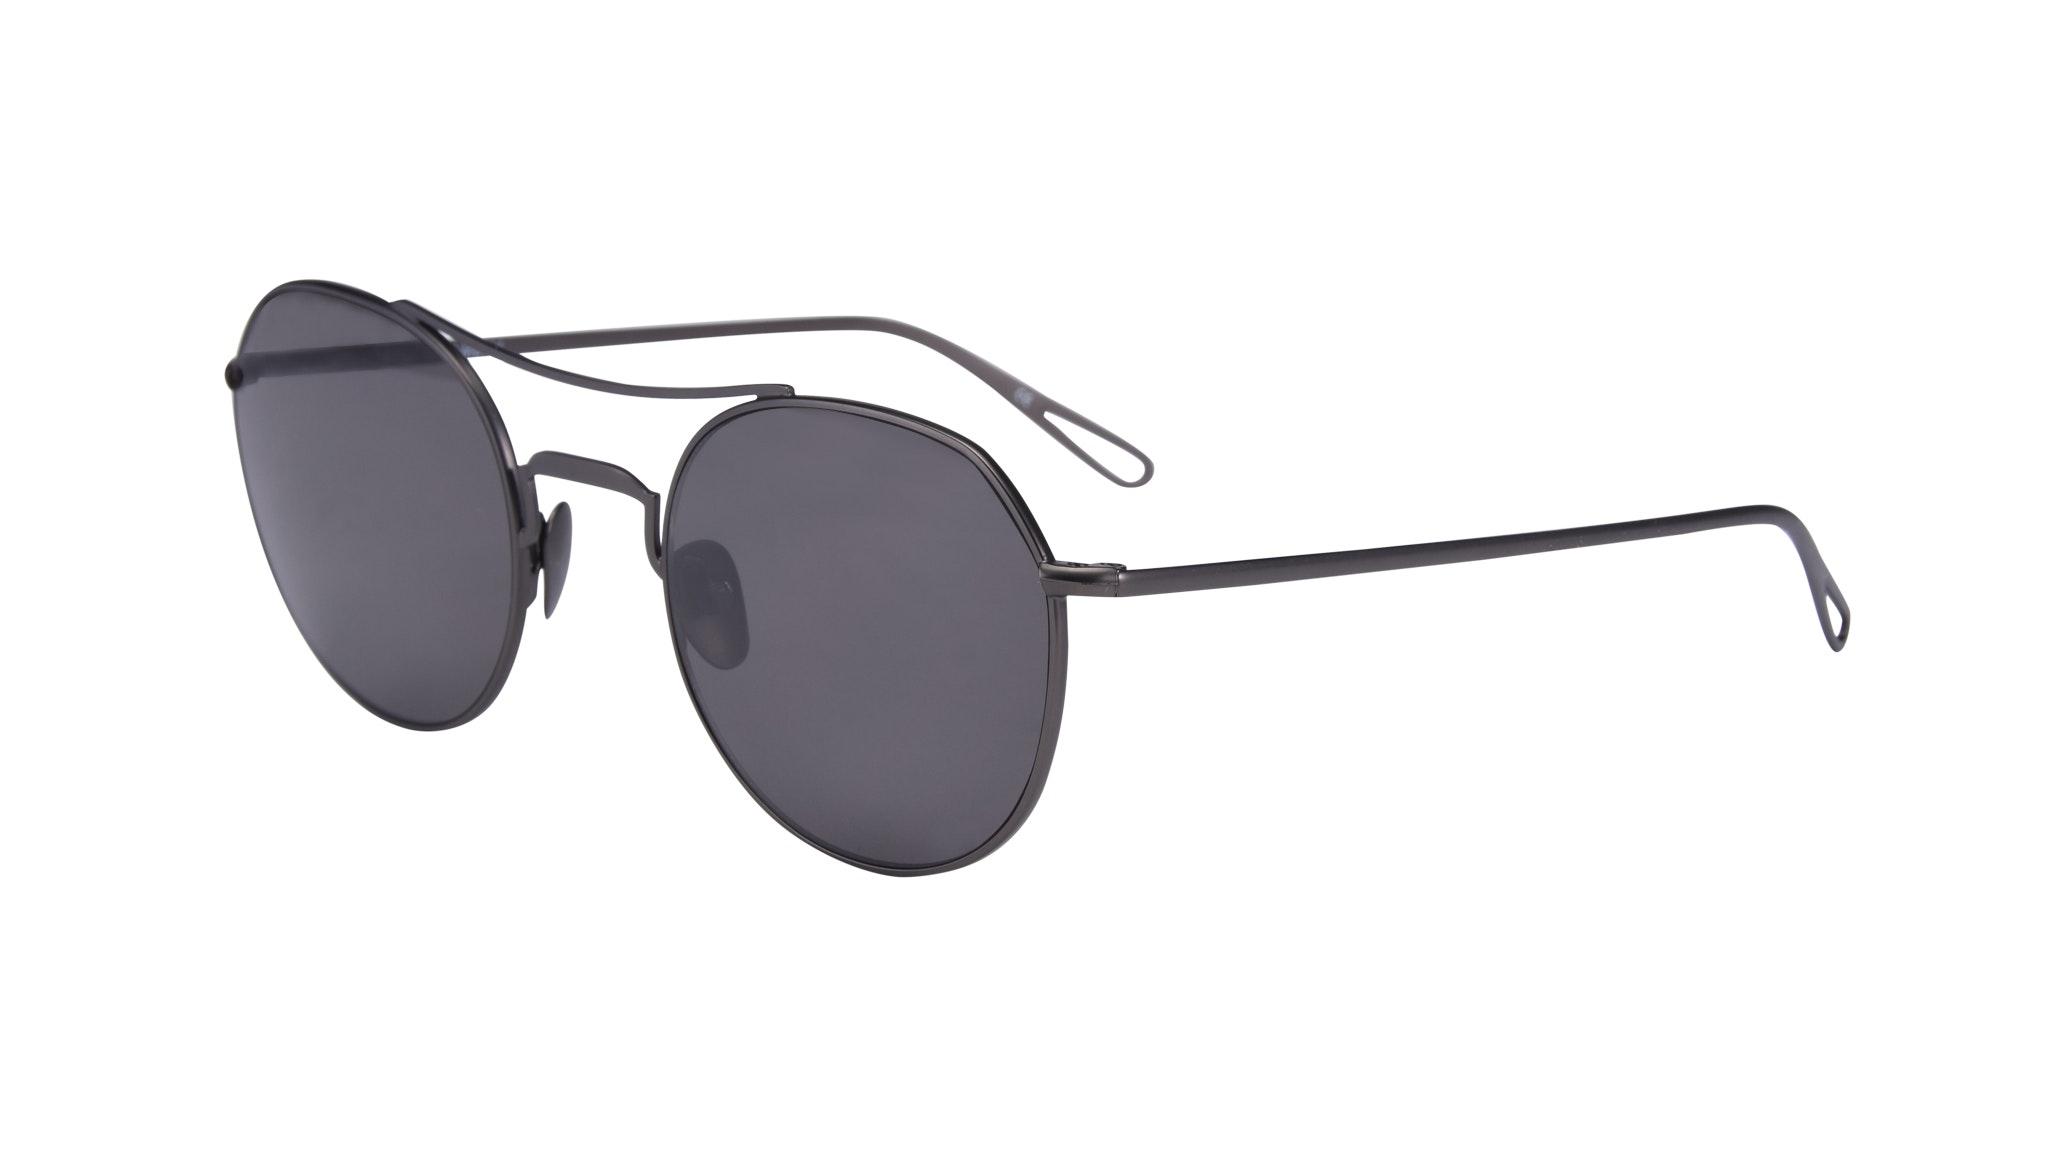 Affordable Fashion Glasses Aviator Sunglasses Men Force Gun Metal Tilt